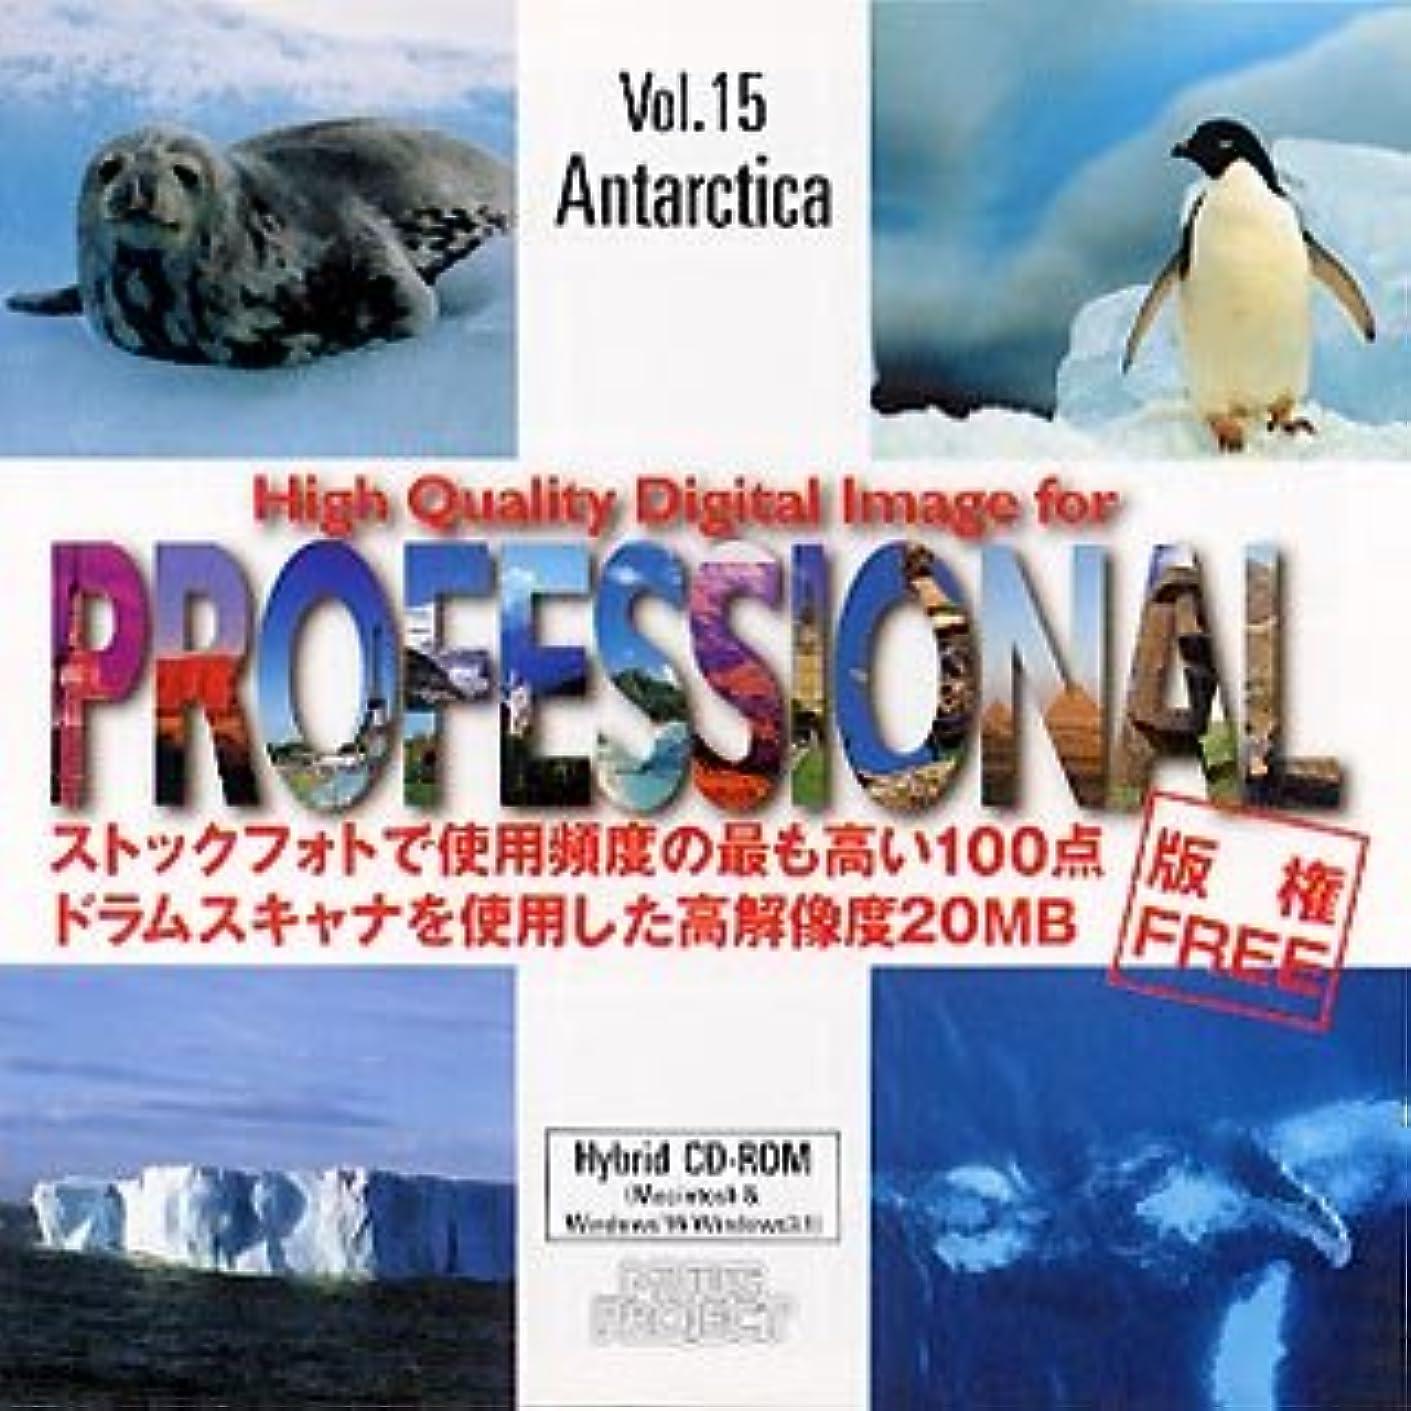 High Quality Digital Image for Professional Vol.15 Antarctica